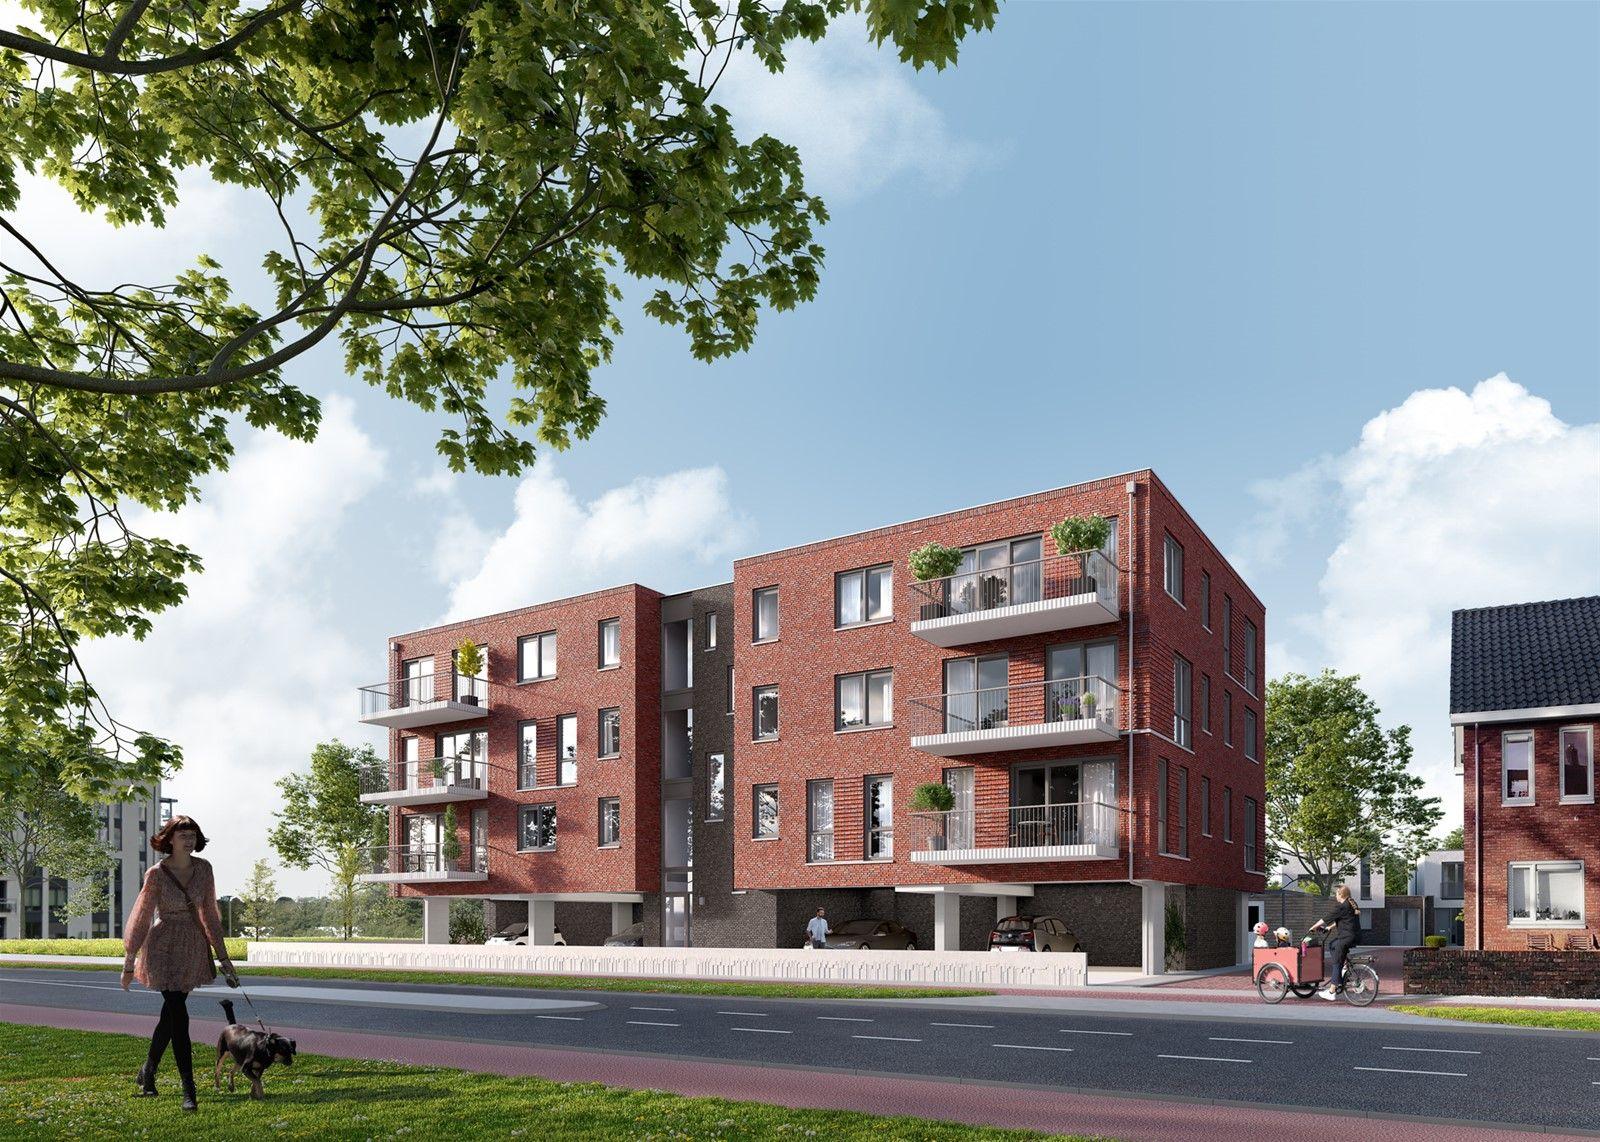 Bongersstraat 79, Ulft